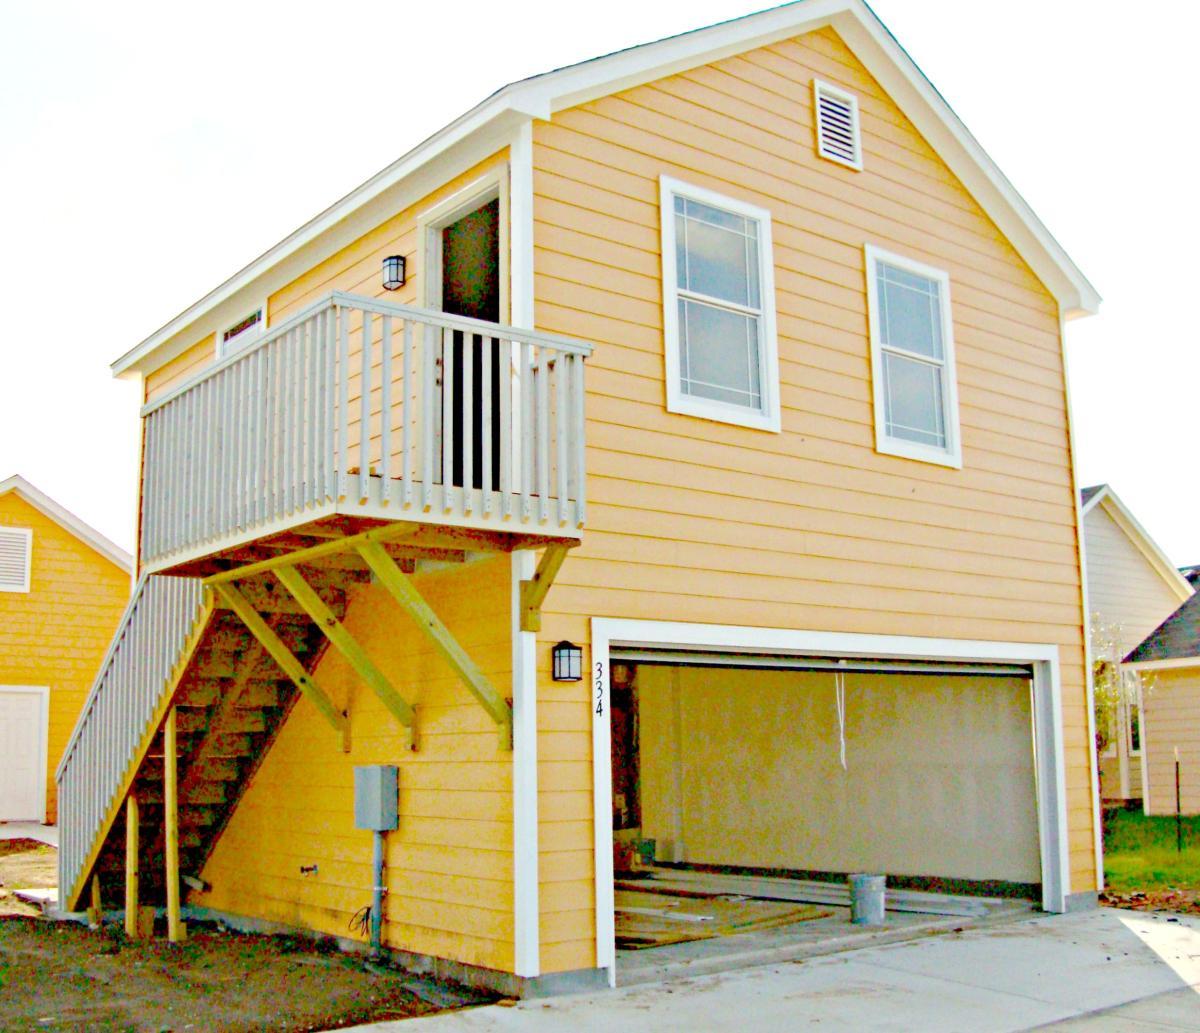 Garages For Rent: 334 Newberry Trail Garage, San Marcos, TX 78666